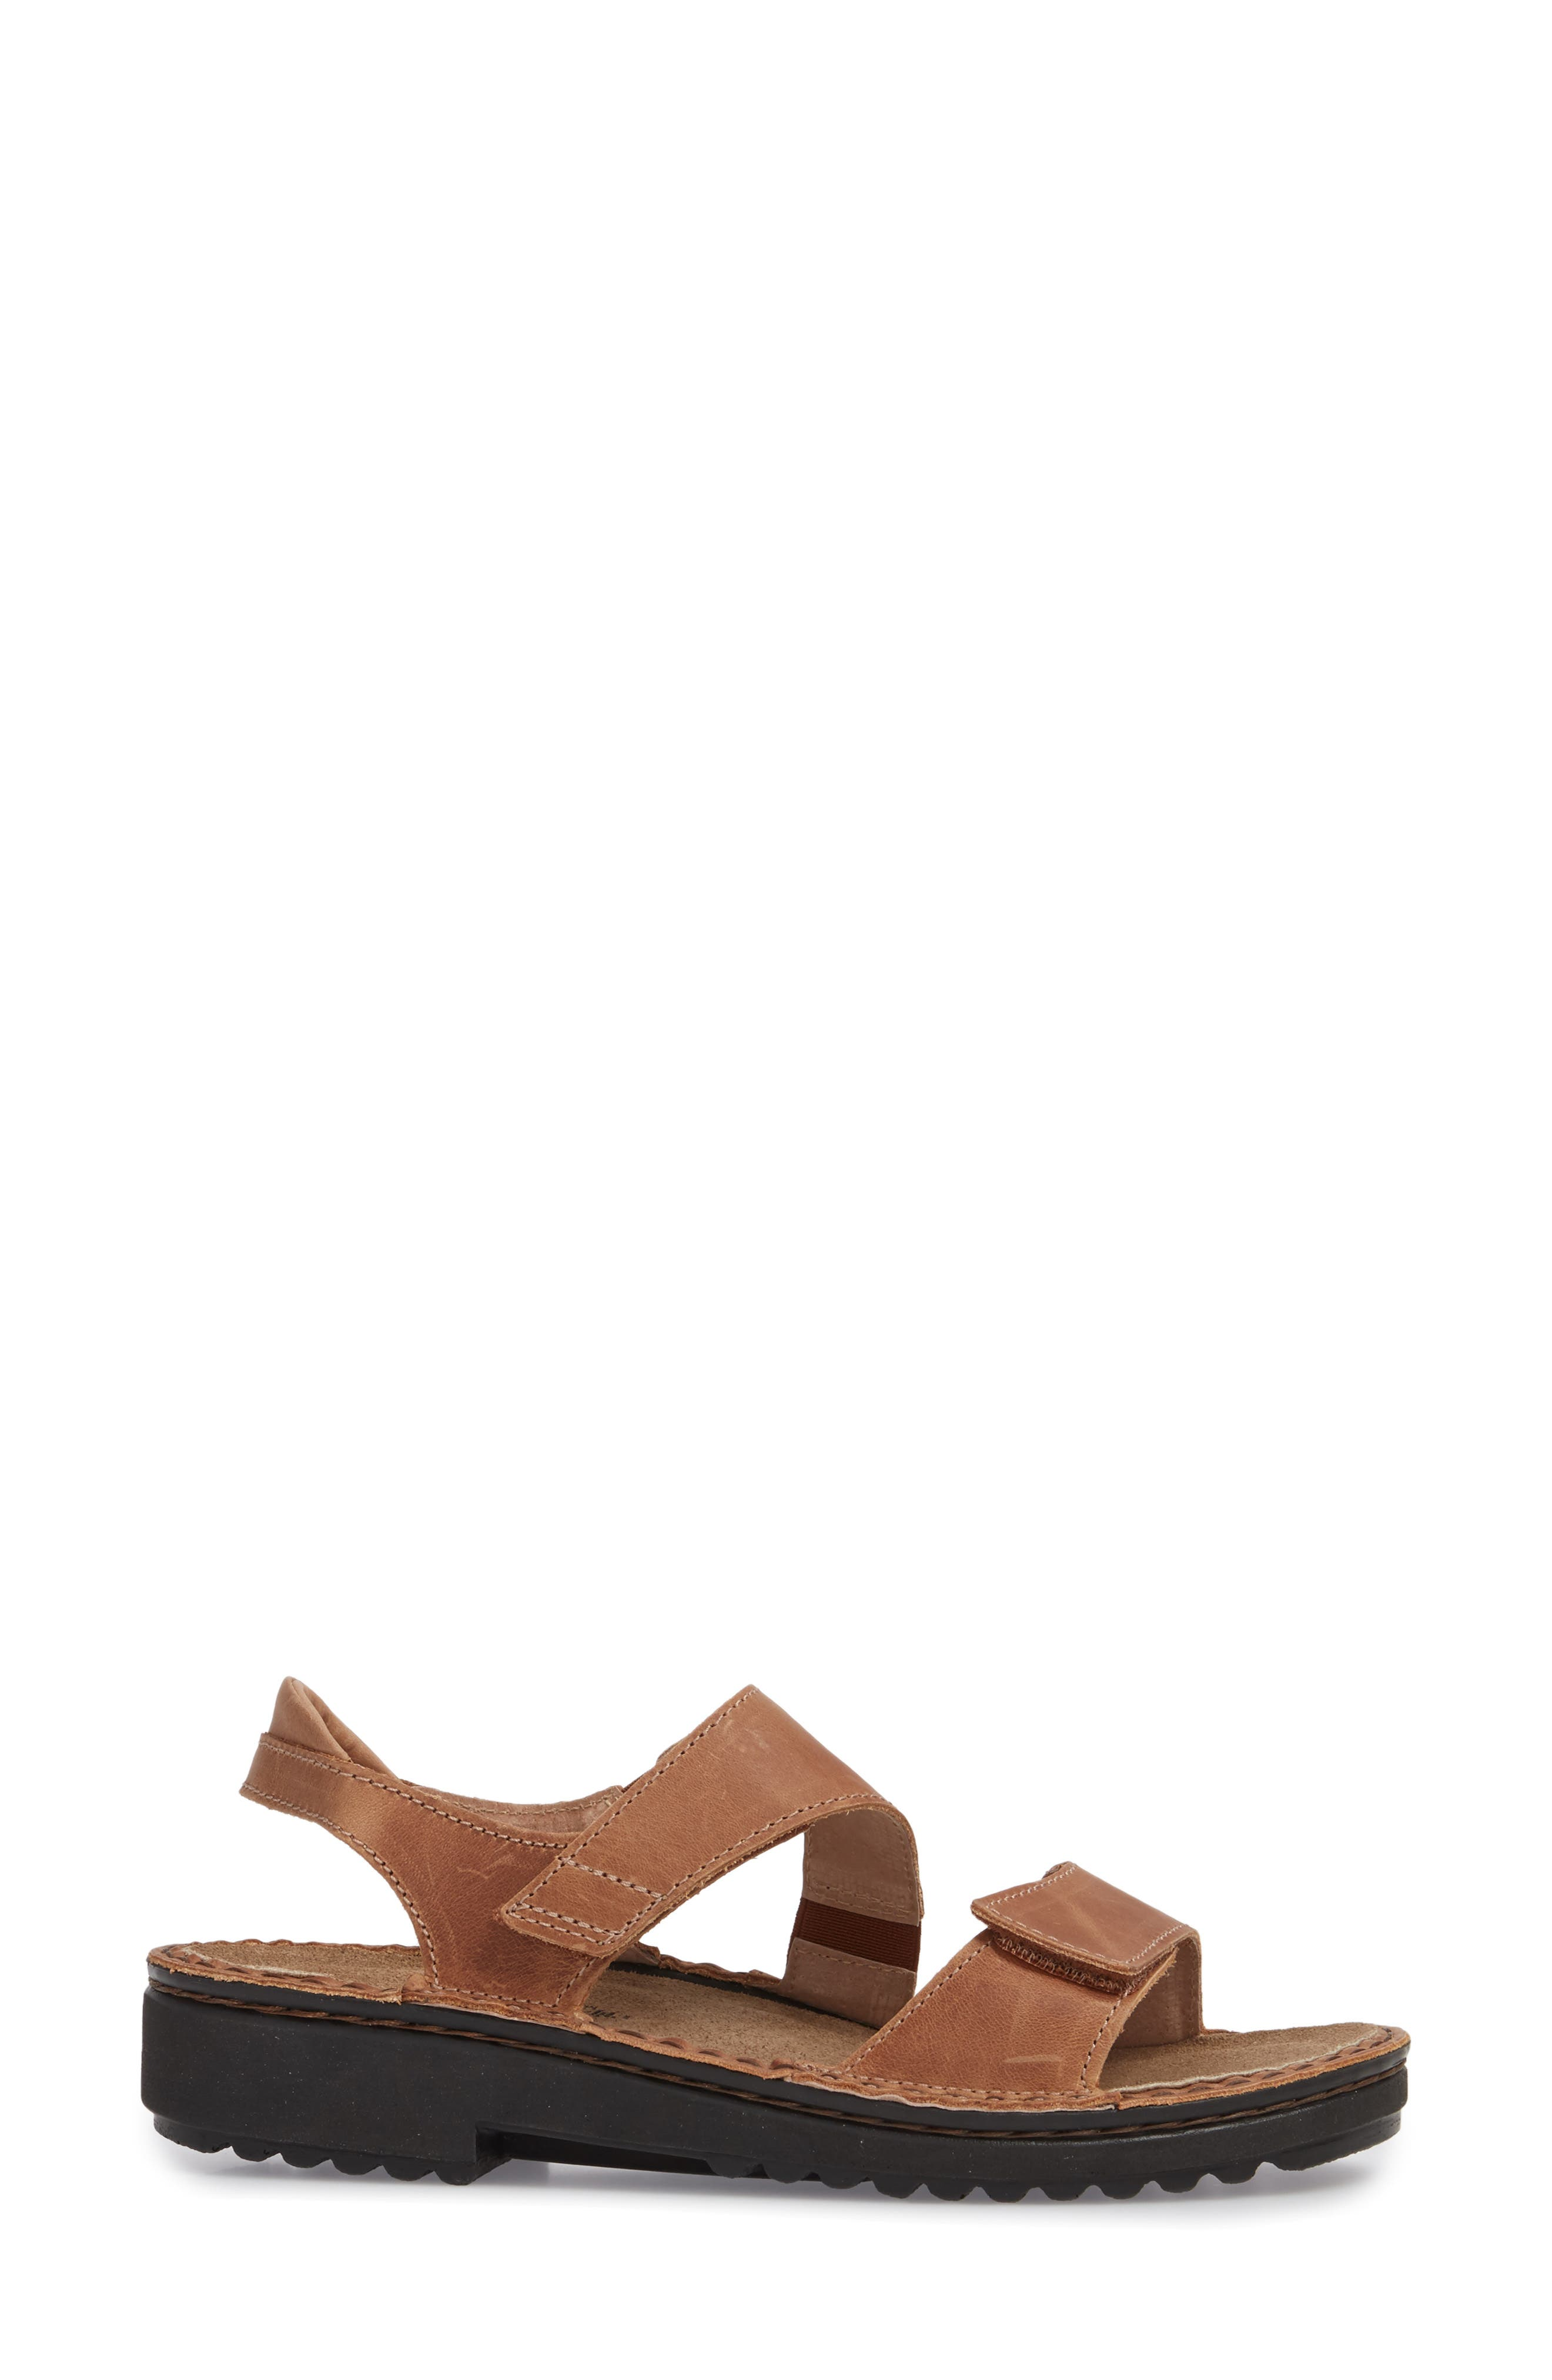 Enid Sandal,                             Alternate thumbnail 3, color,                             Latte Brown Leather